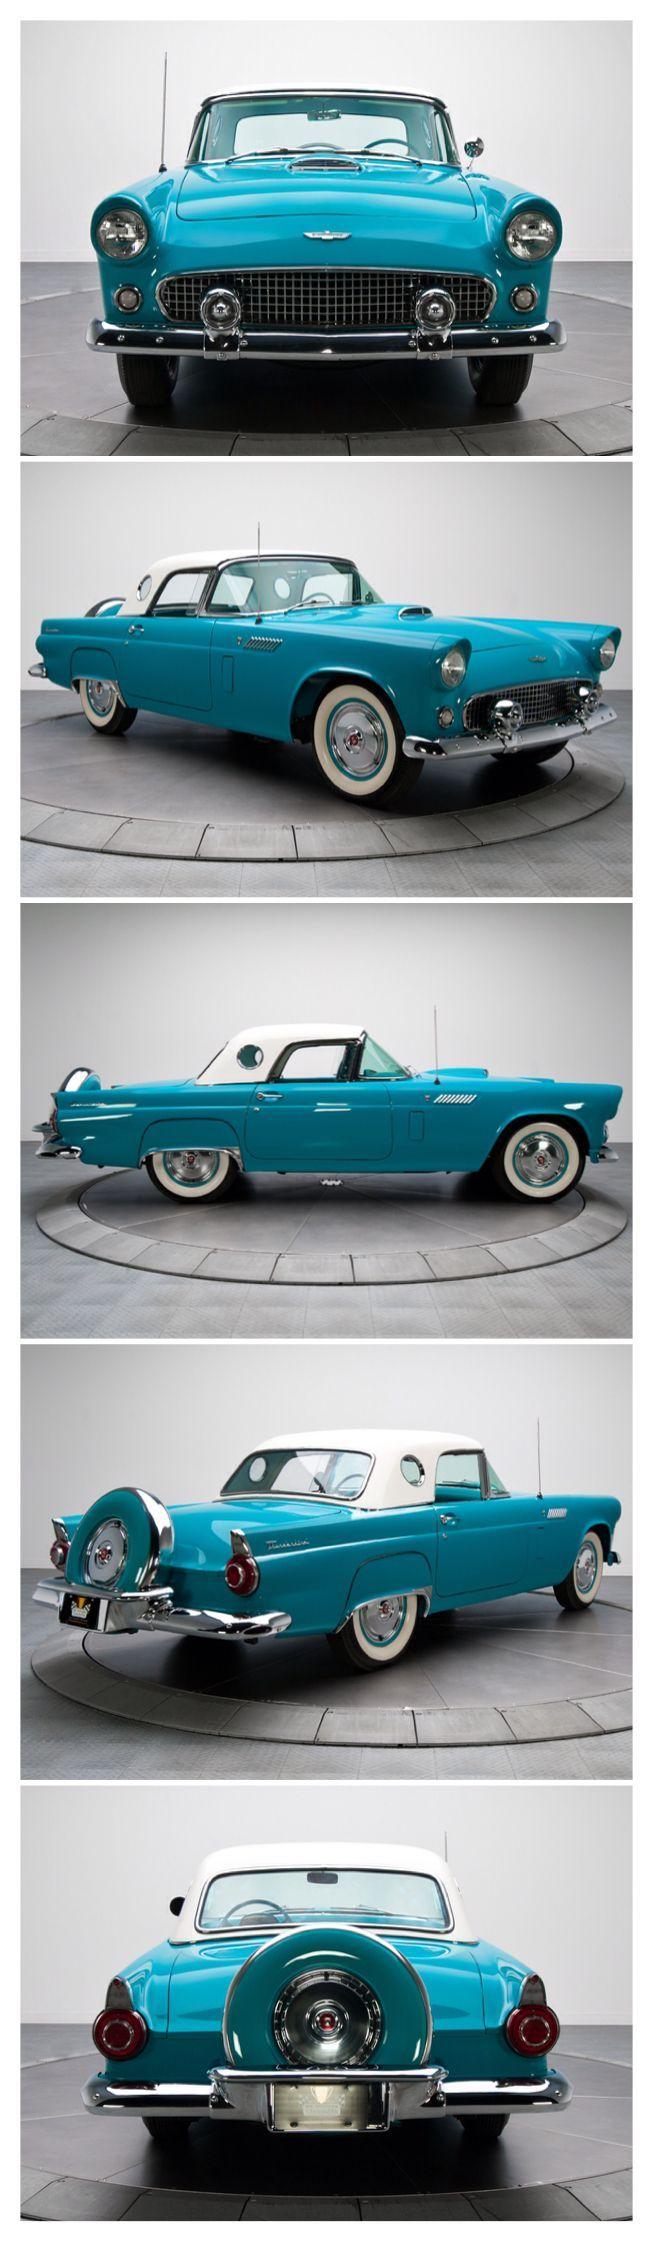 1956 chevrolet belair mjc classic cars pristine - 1956 Ford T Bird